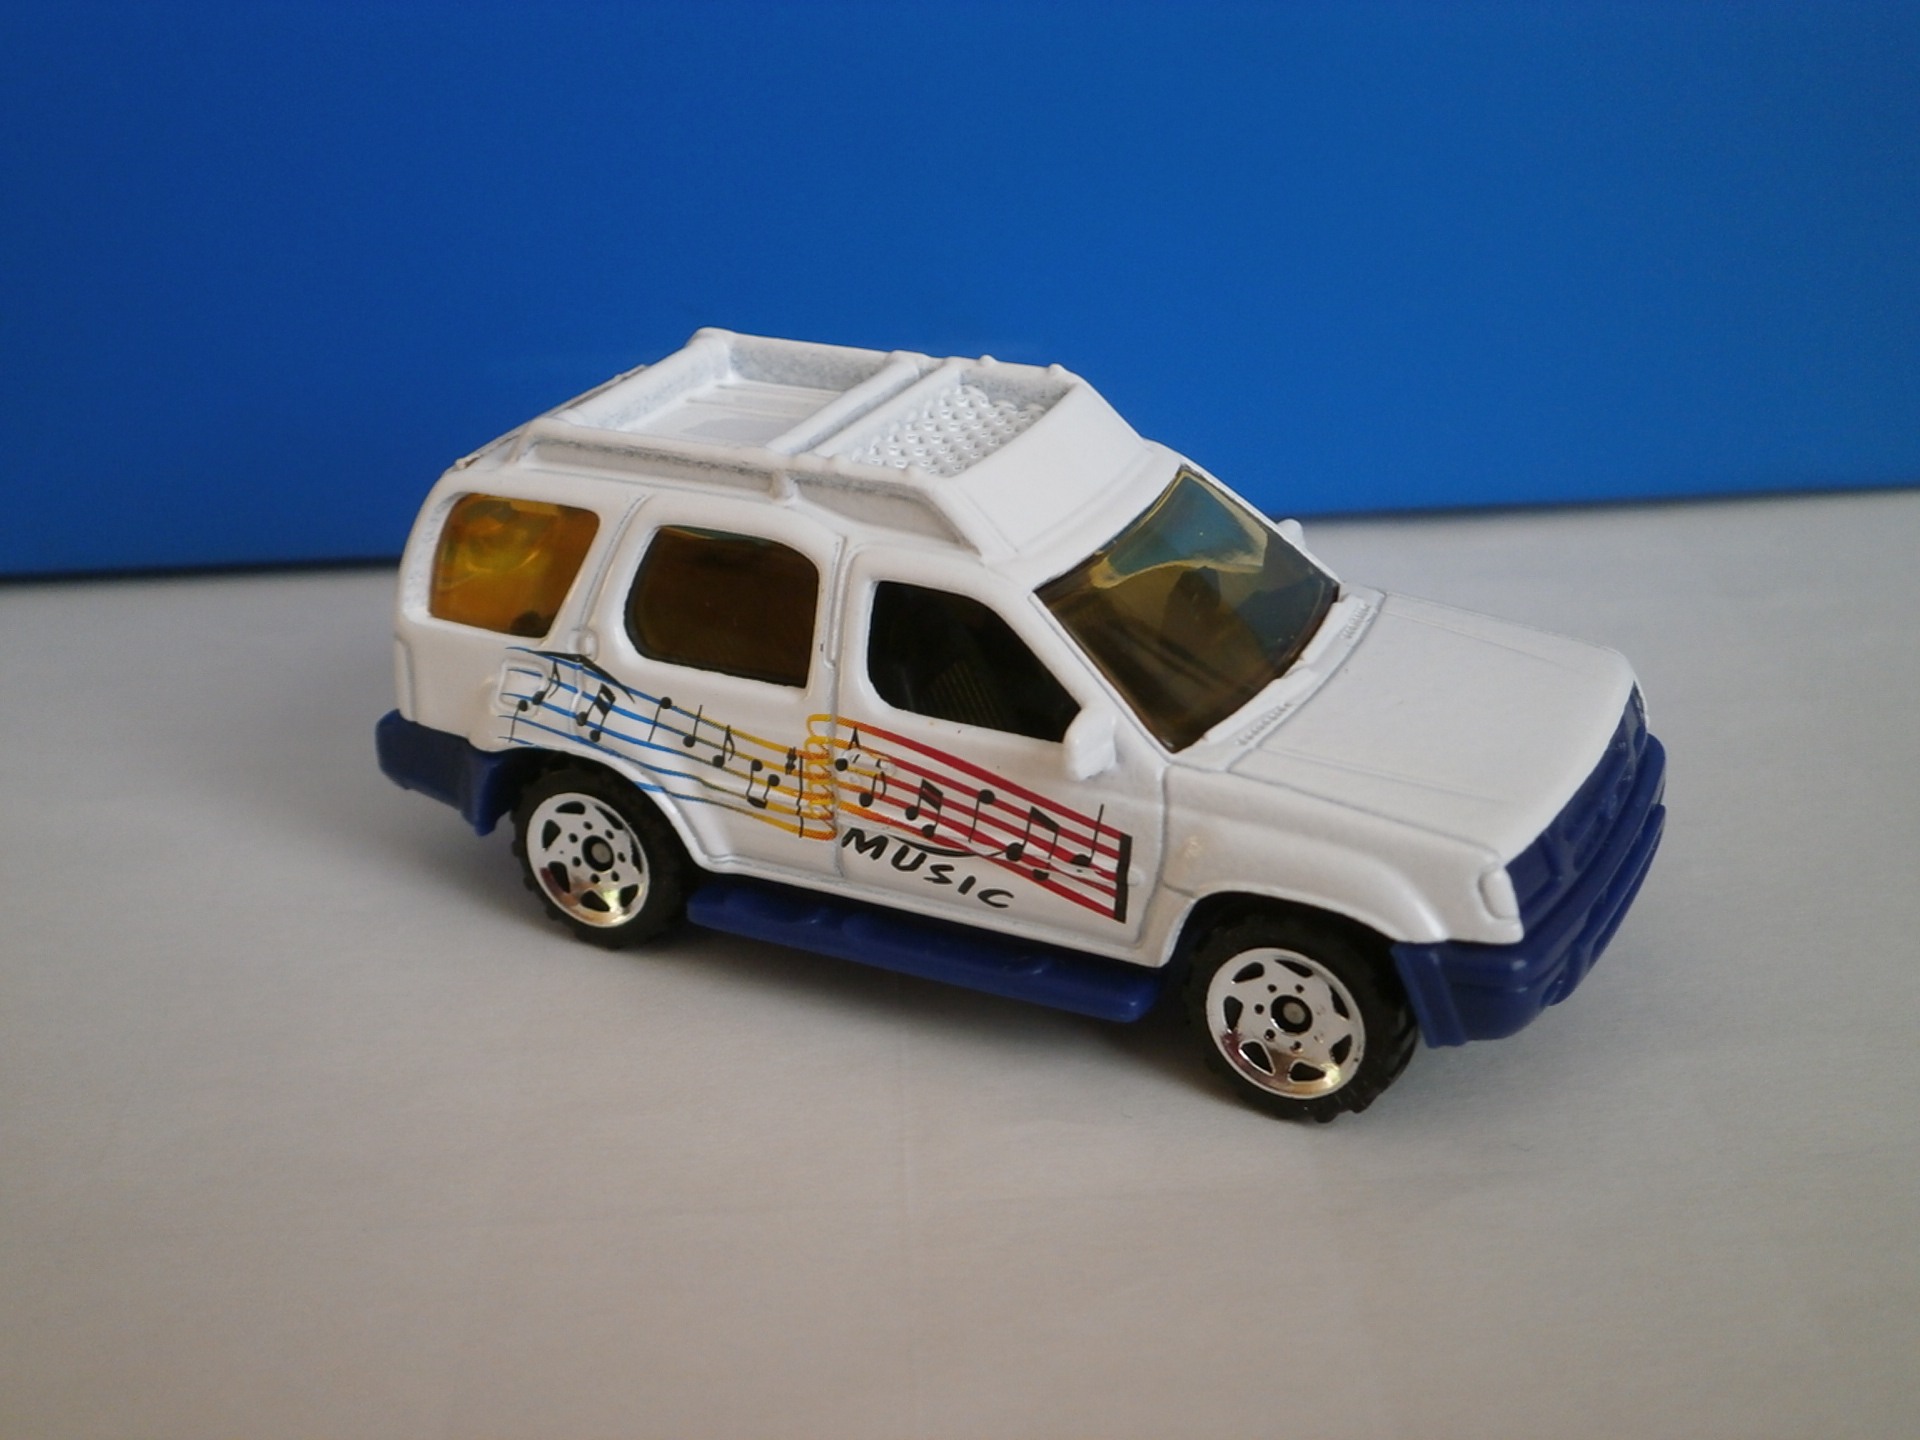 Image Nissan Xterra 2001 5 Pack Jpg Matchbox Cars Wiki